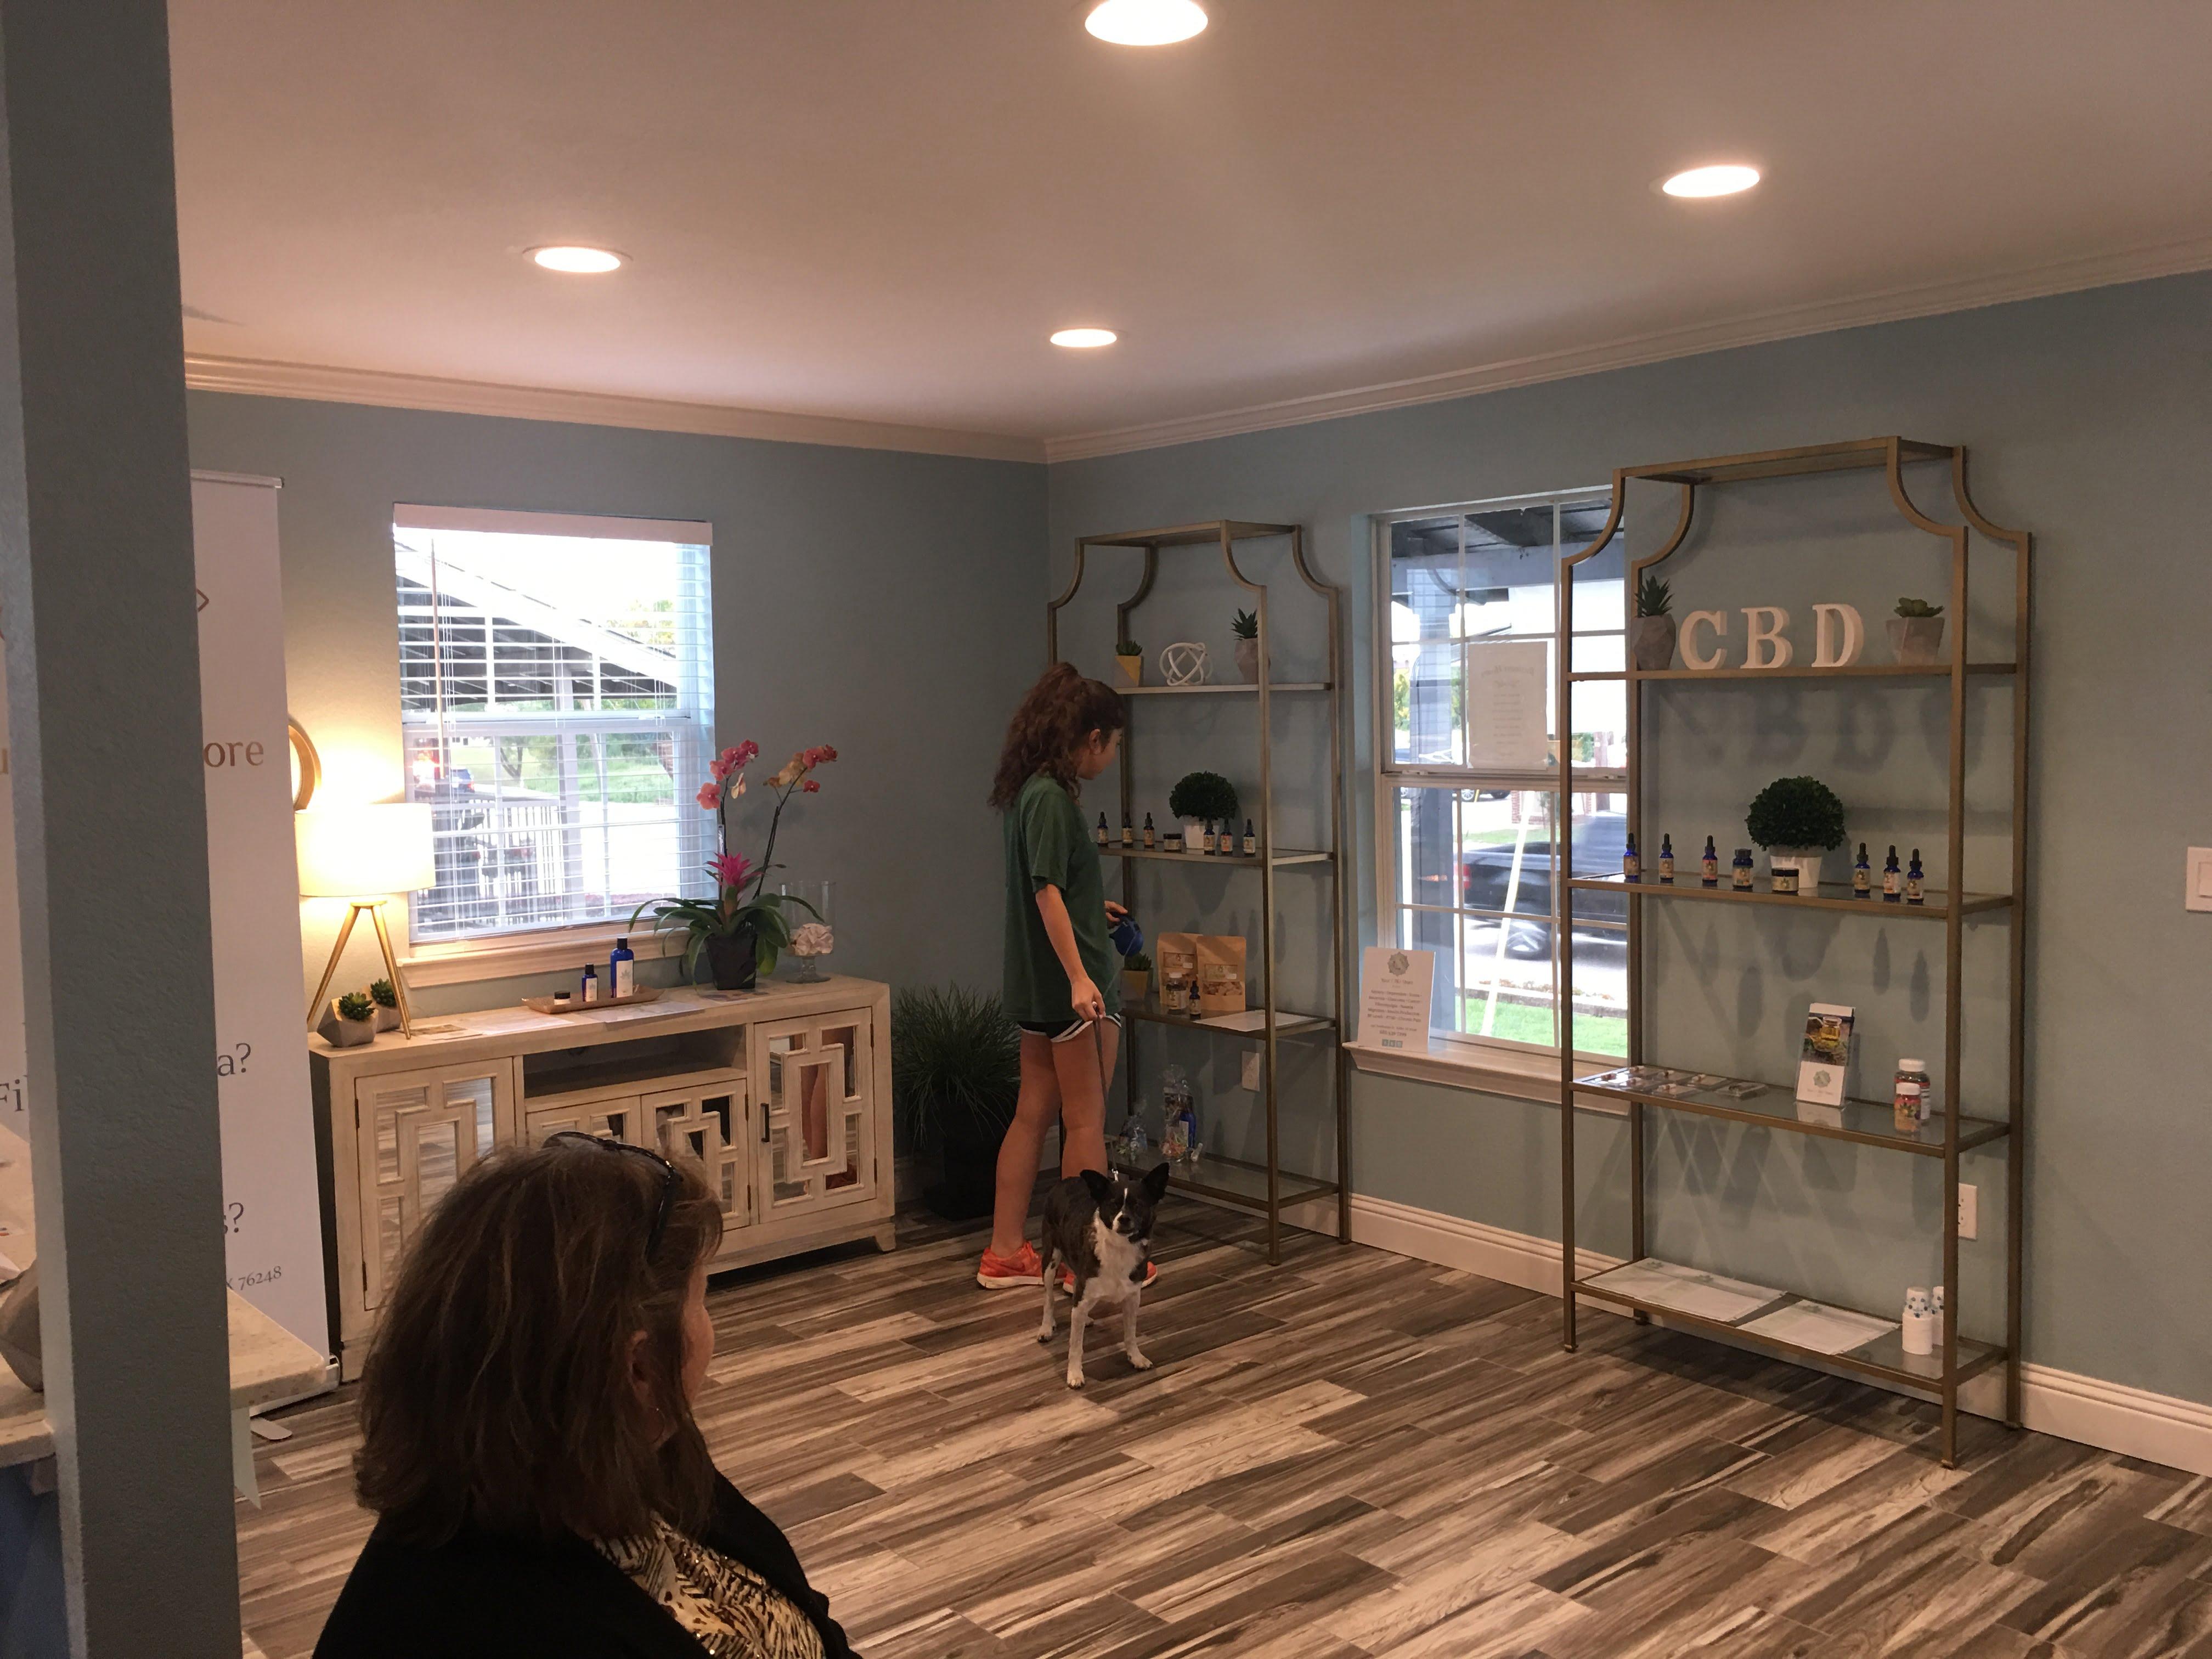 Your CBD Store Keller Texas - Dallas Fort Worth CBD Products